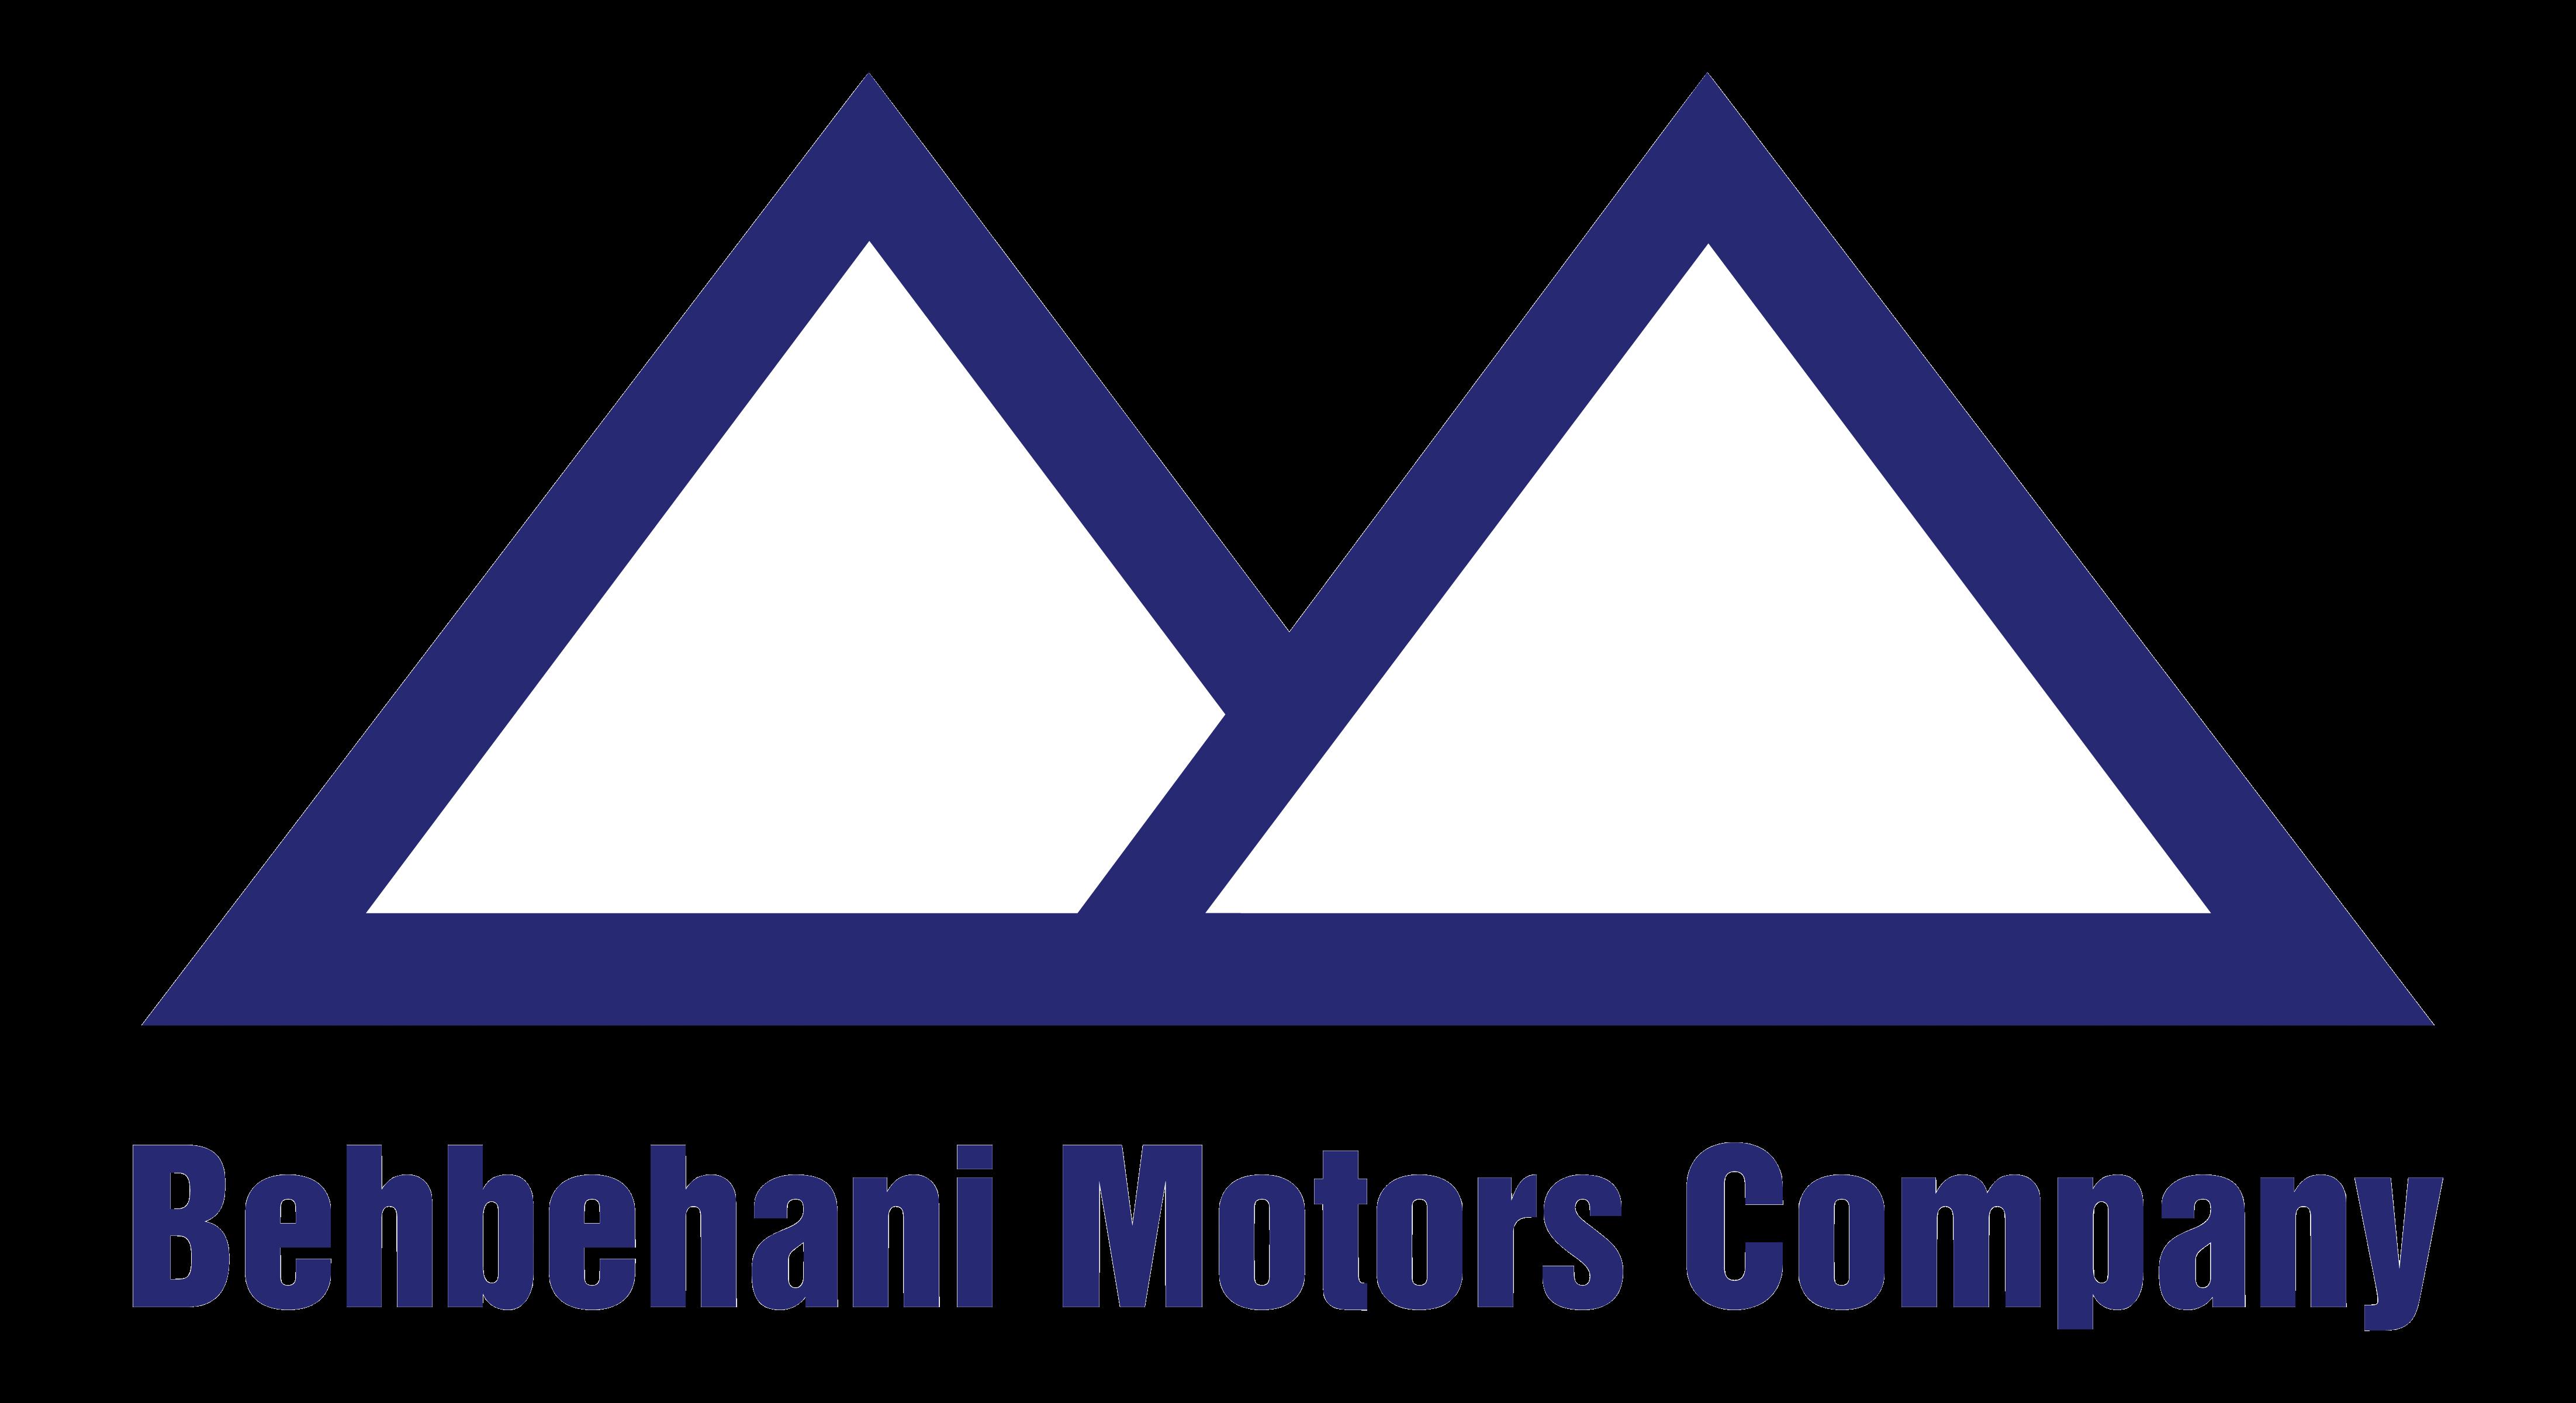 Behbehani Motors Company